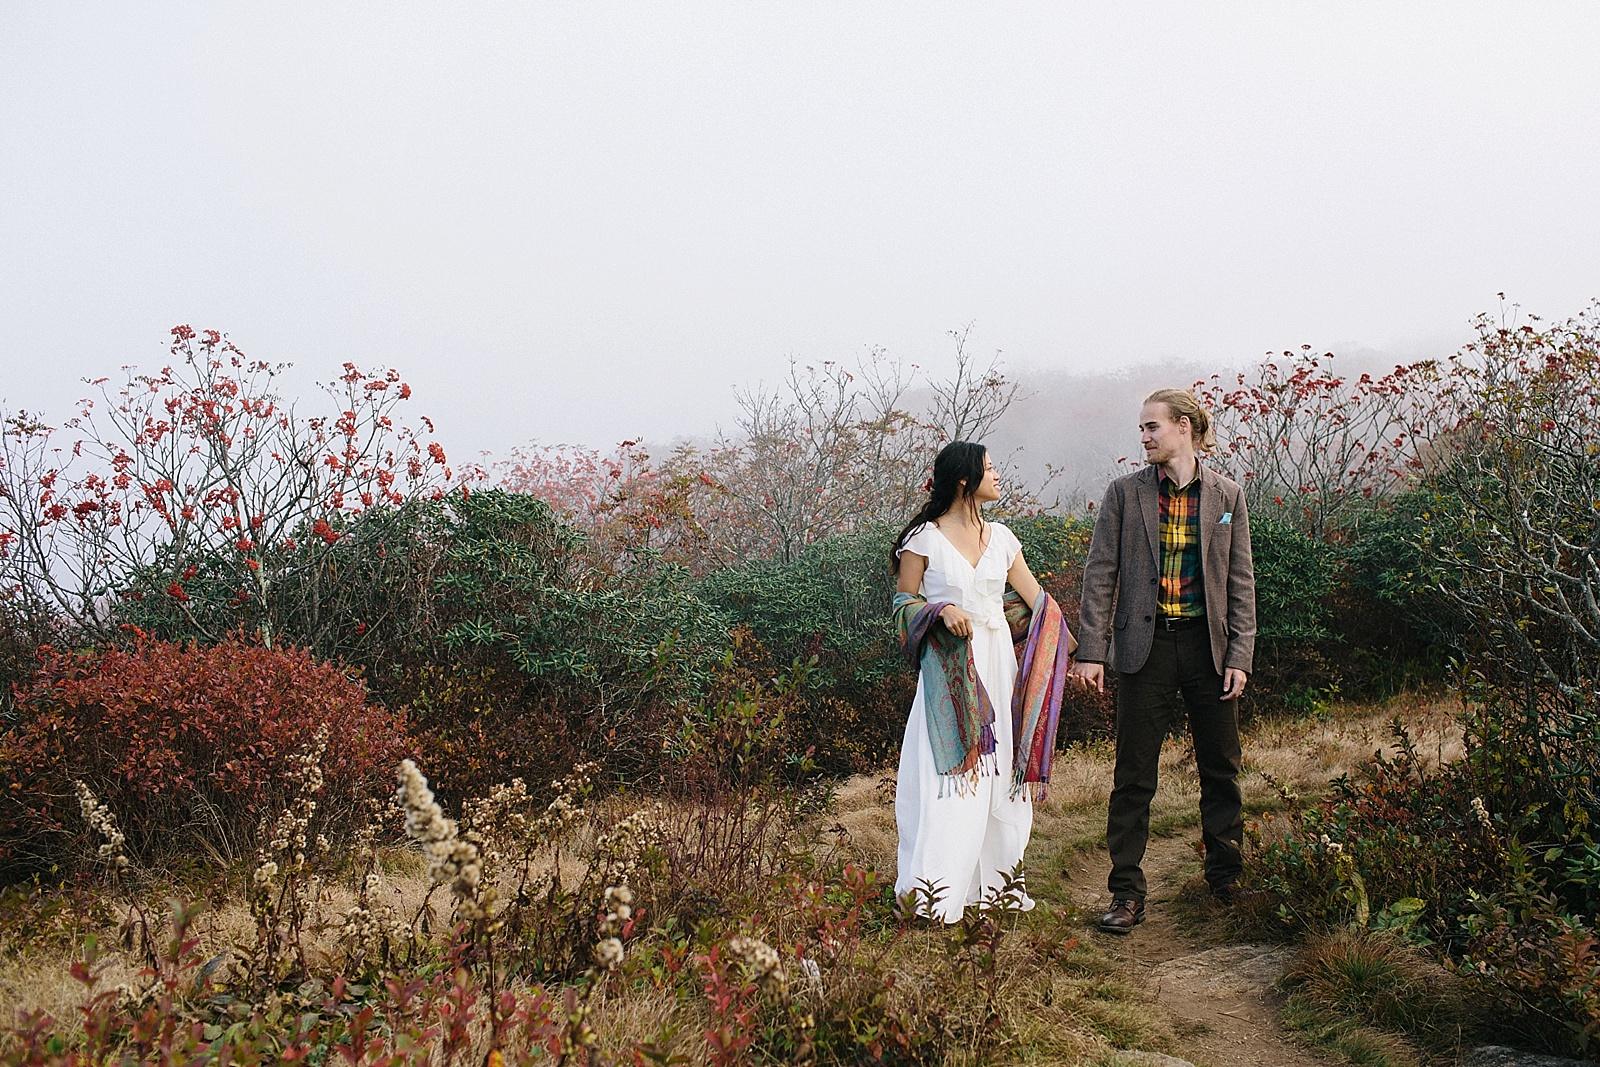 diana-elizabeth-blog-travel-fashion-blogger-north-carolina-wedding-elopement-craggy-pinnacle-trail_0009